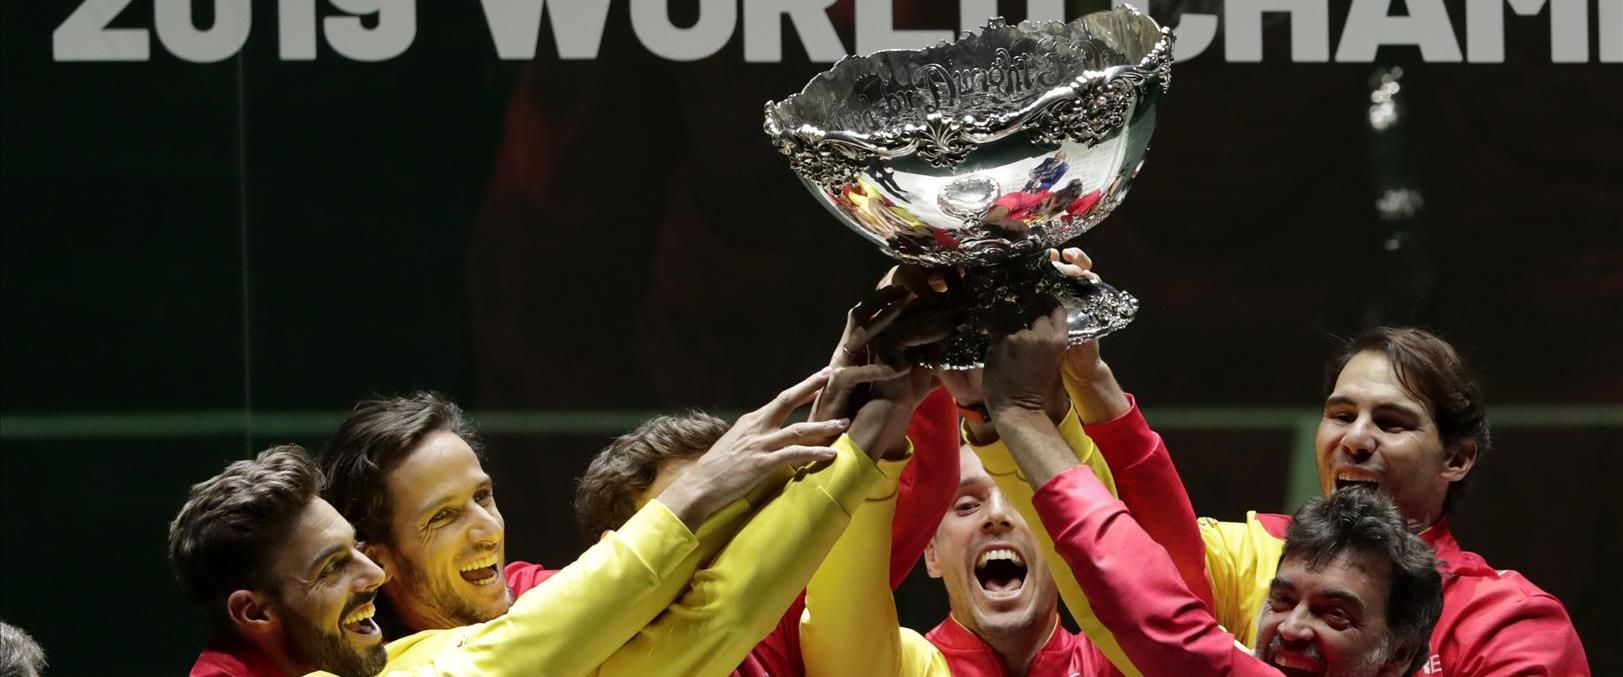 ספרד זוכה בגביע דיוויס